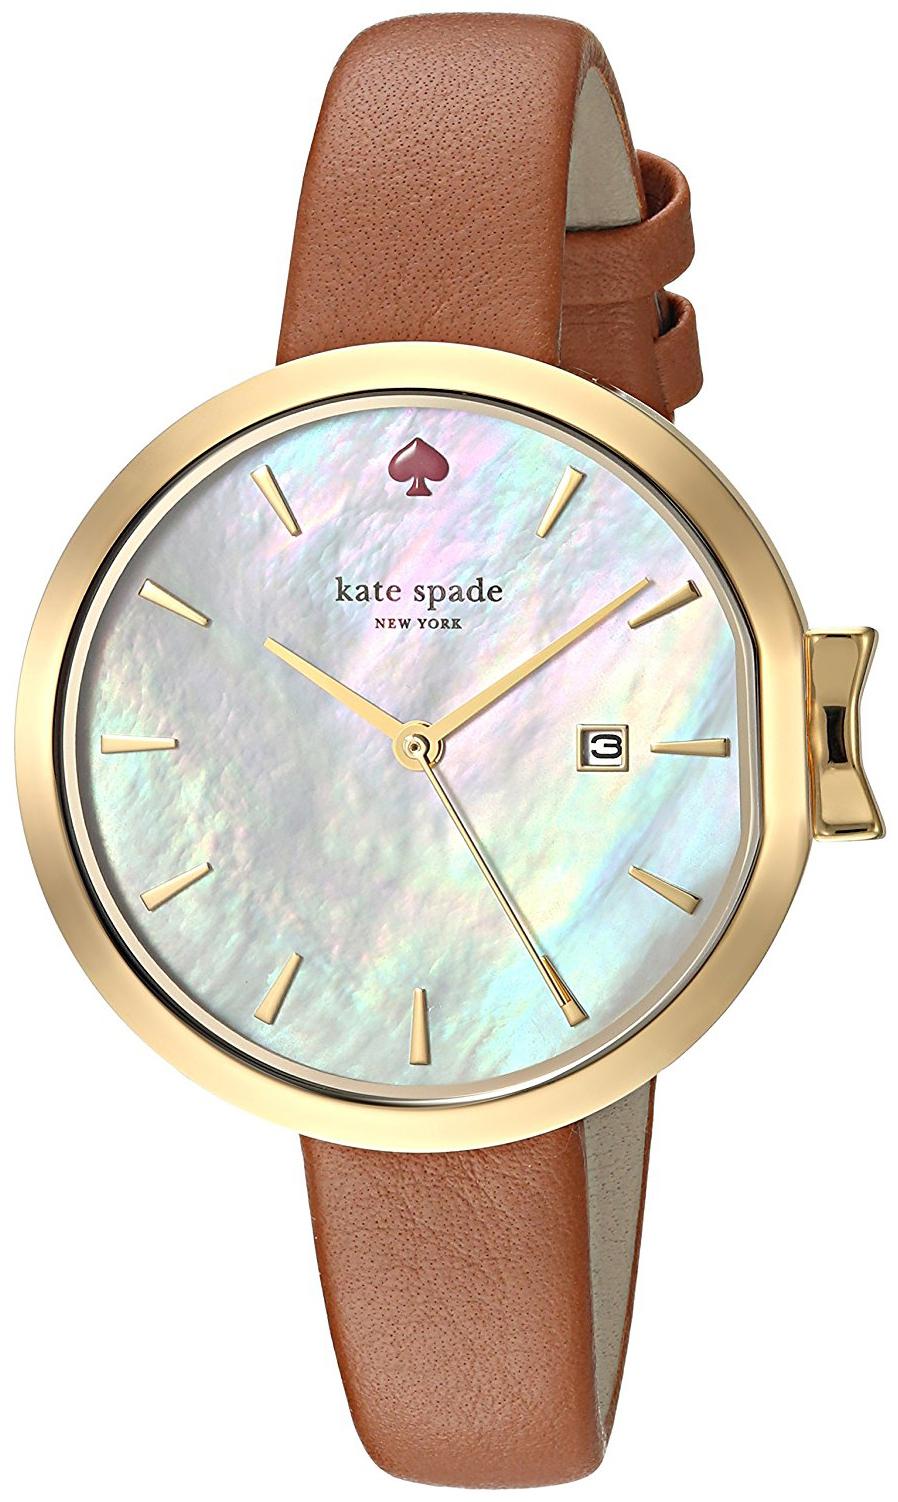 Kate Spade 99999 Damklocka KSW1324 Silverfärgad/Läder Ø34 mm - Kate Spade